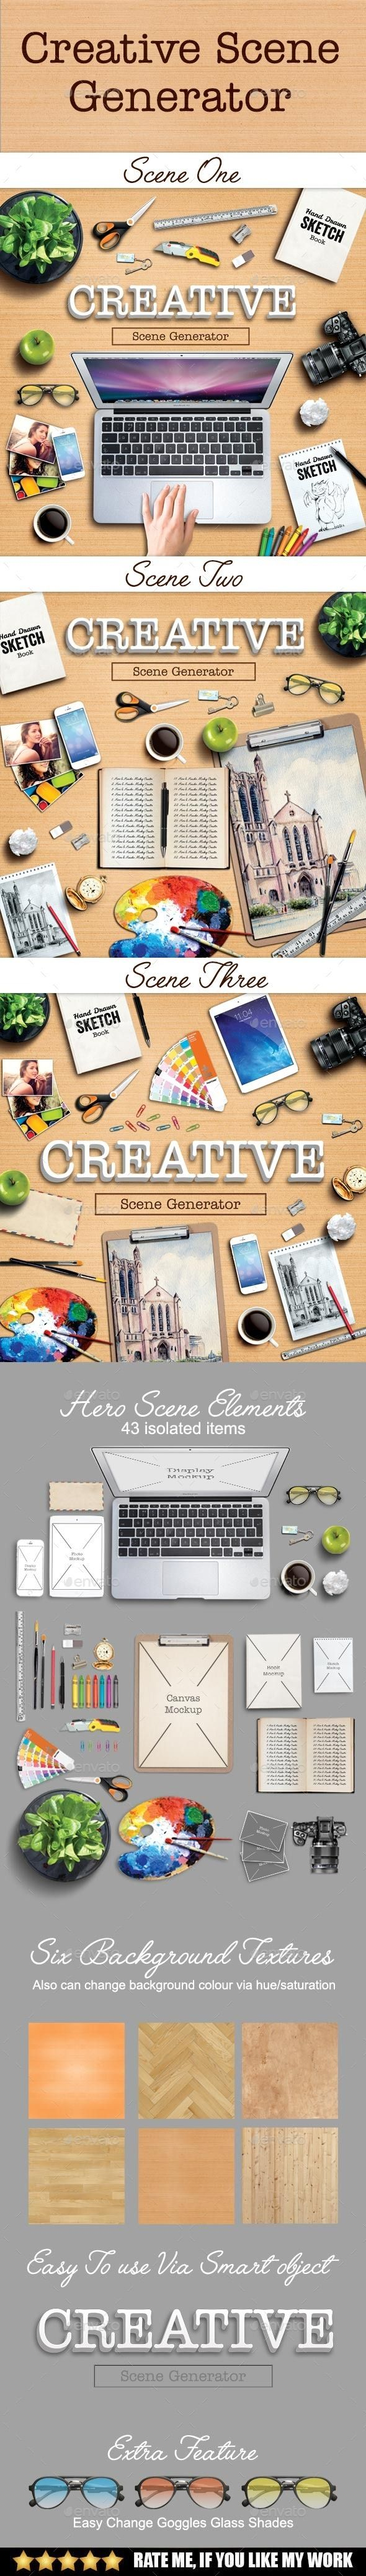 Poster design generator - Creative Scene Generator